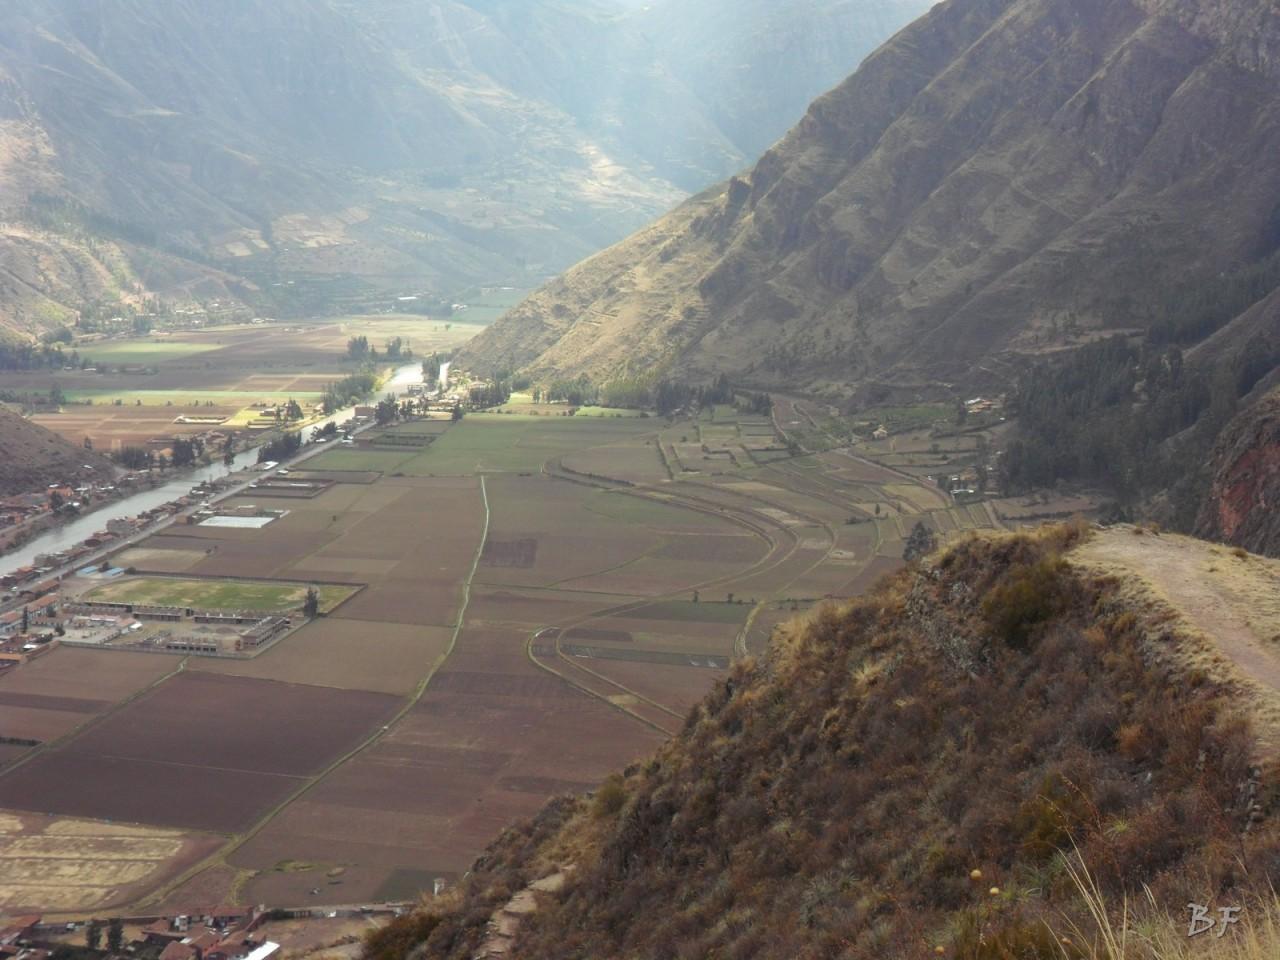 Mura-Poligonali-Megaliti-Altari-Rupestri-Pisac-Cusco-Perù-85